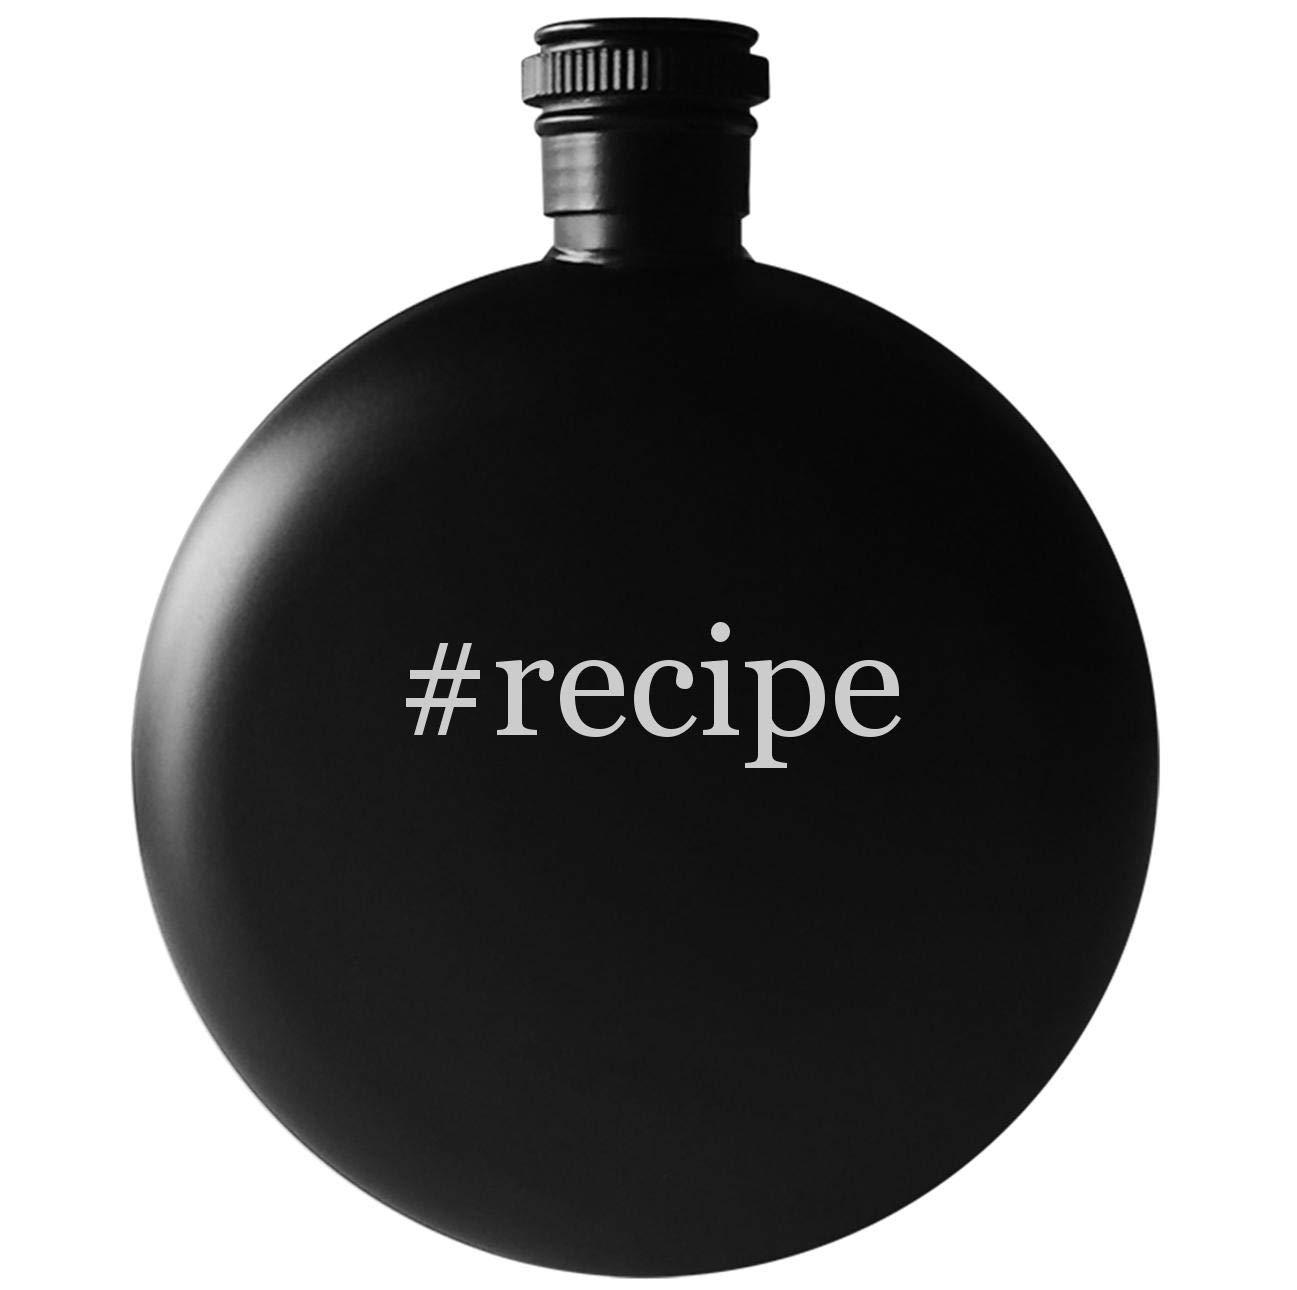 #recipe - 5oz Round Hashtag Drinking Alcohol Flask, Matte Black